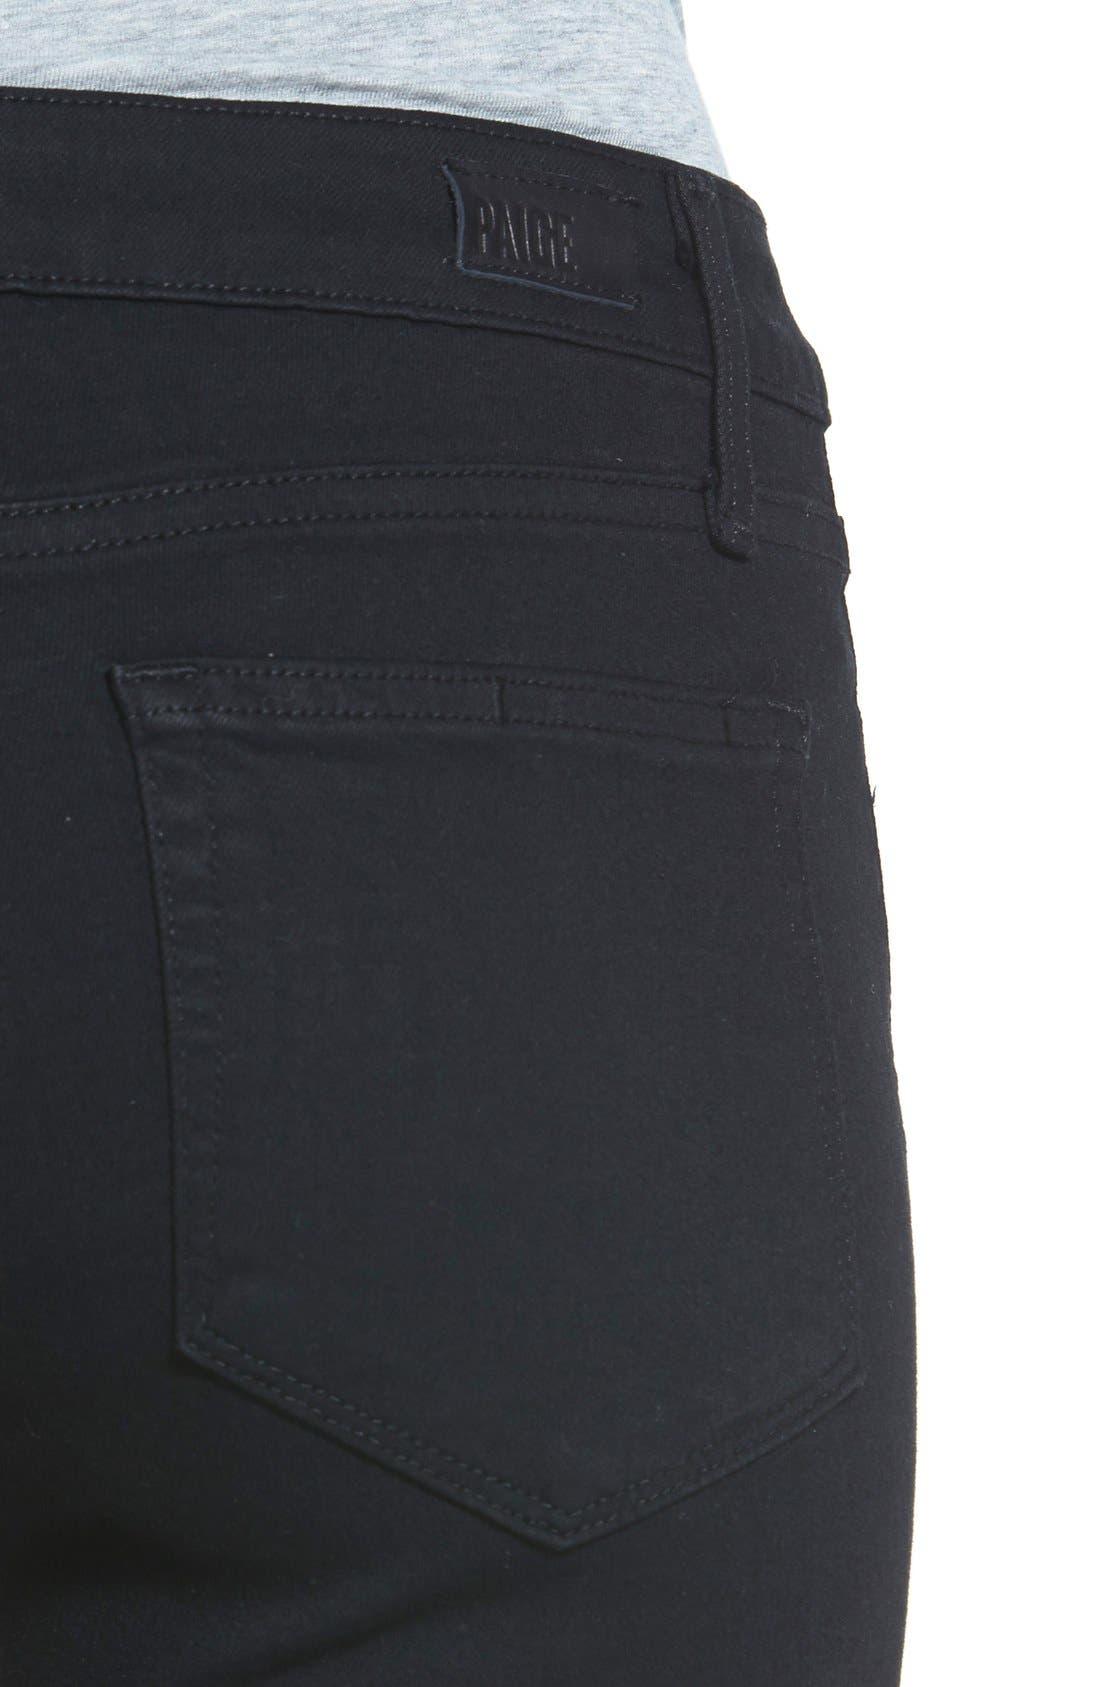 Transcend - Verdugo Ankle Ultra Skinny Jeans,                             Alternate thumbnail 11, color,                             BLACK SHADOW